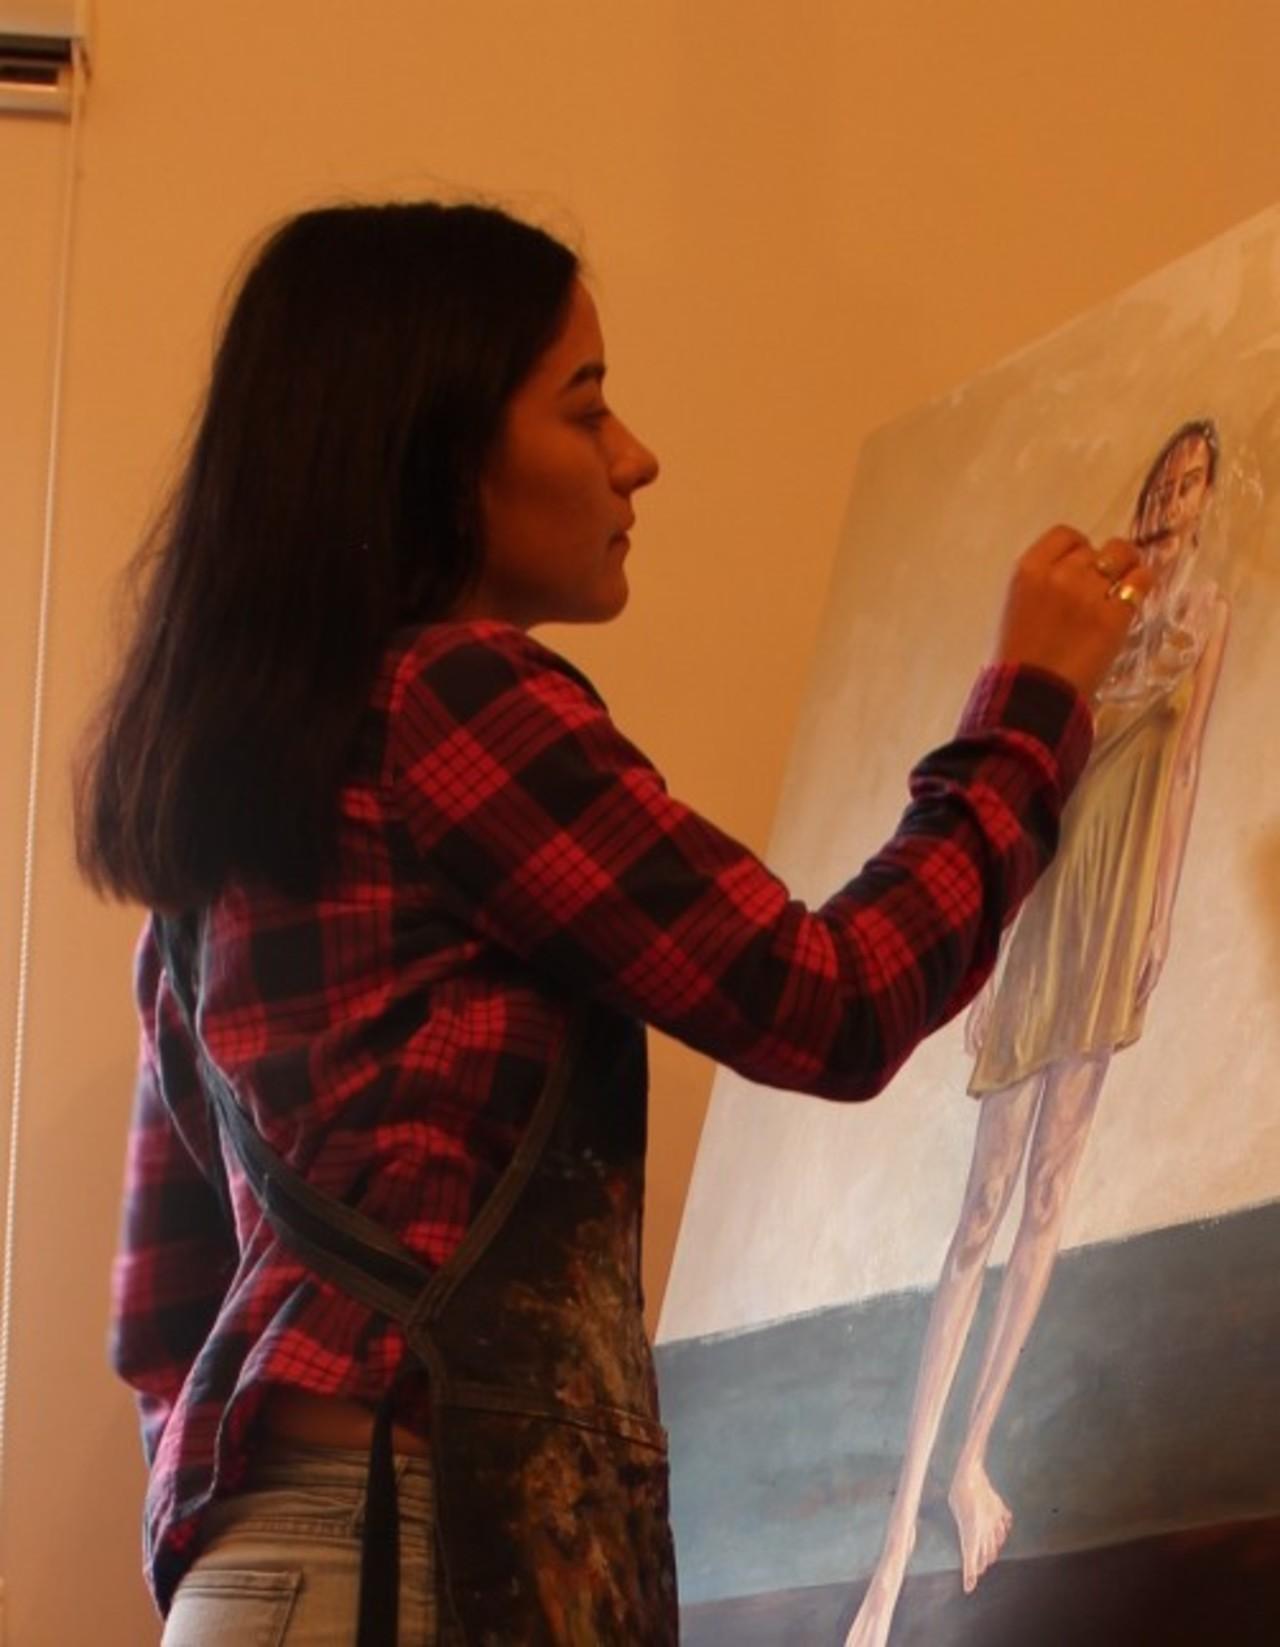 Taller de pintura en agenda del IMAC